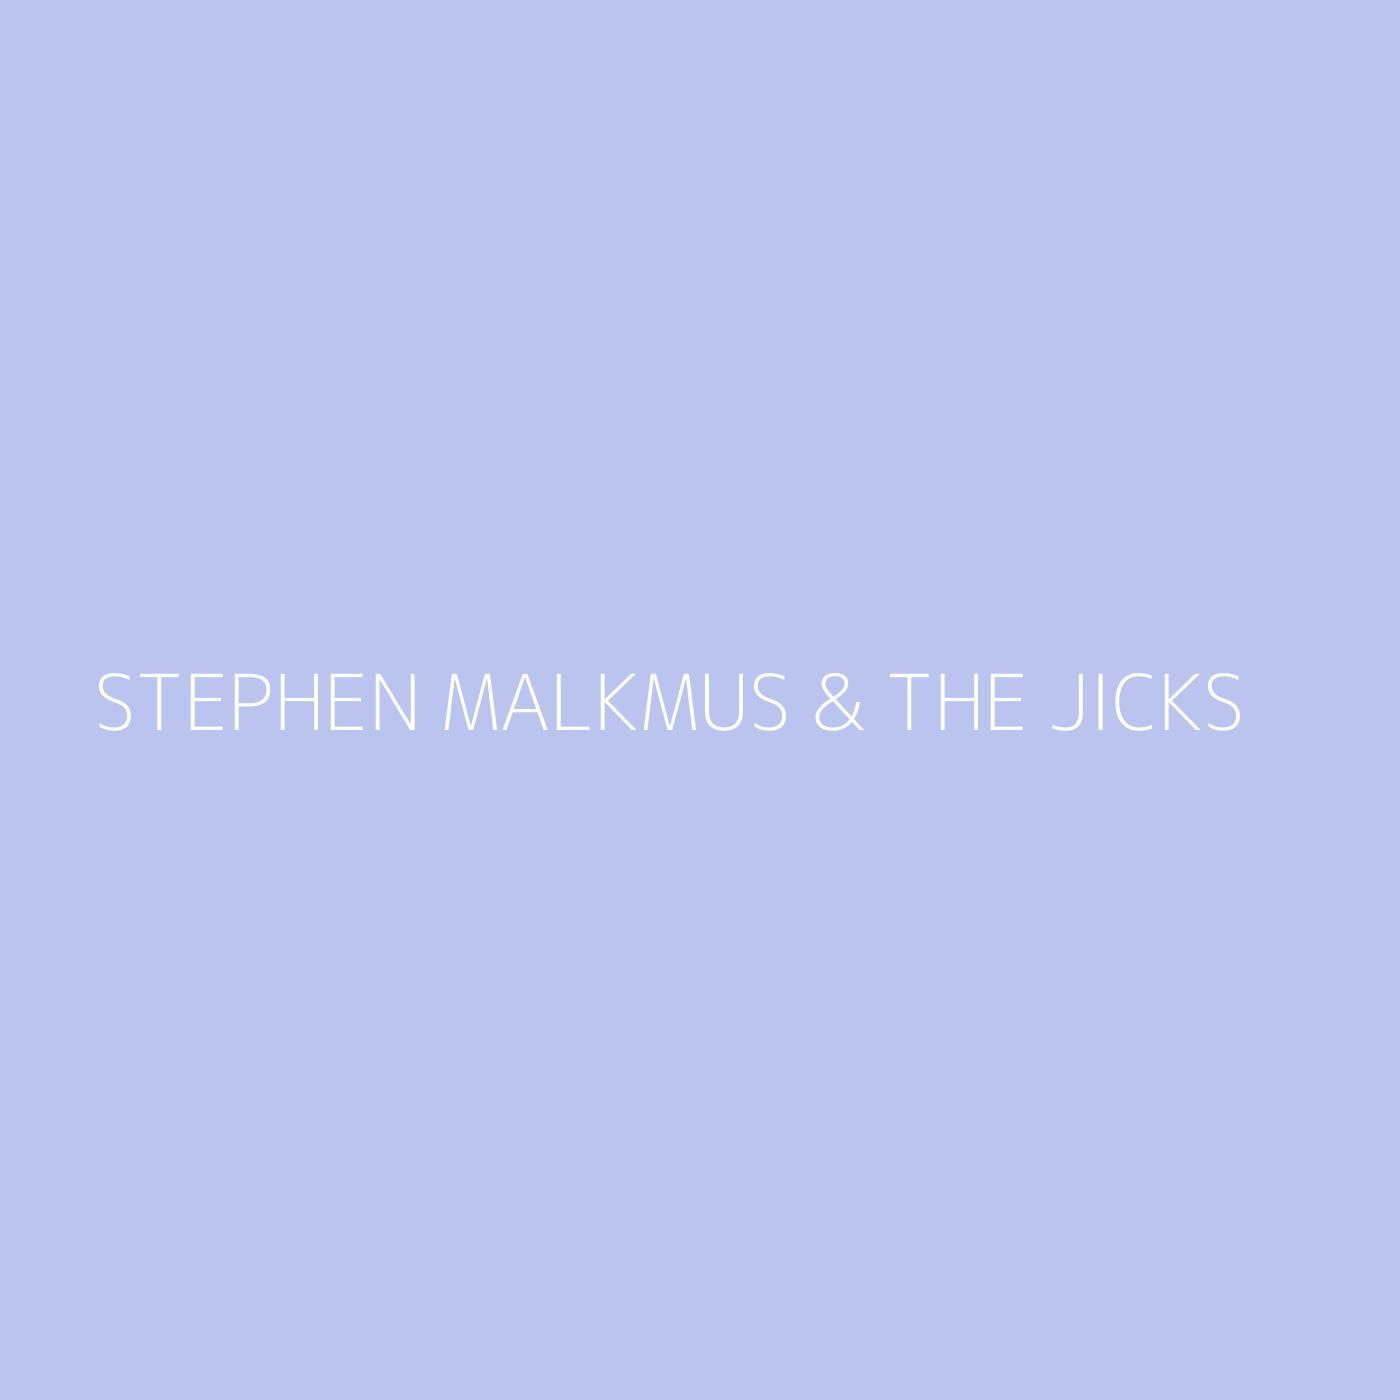 Stephen Malkmus & The Jicks Playlist Artwork